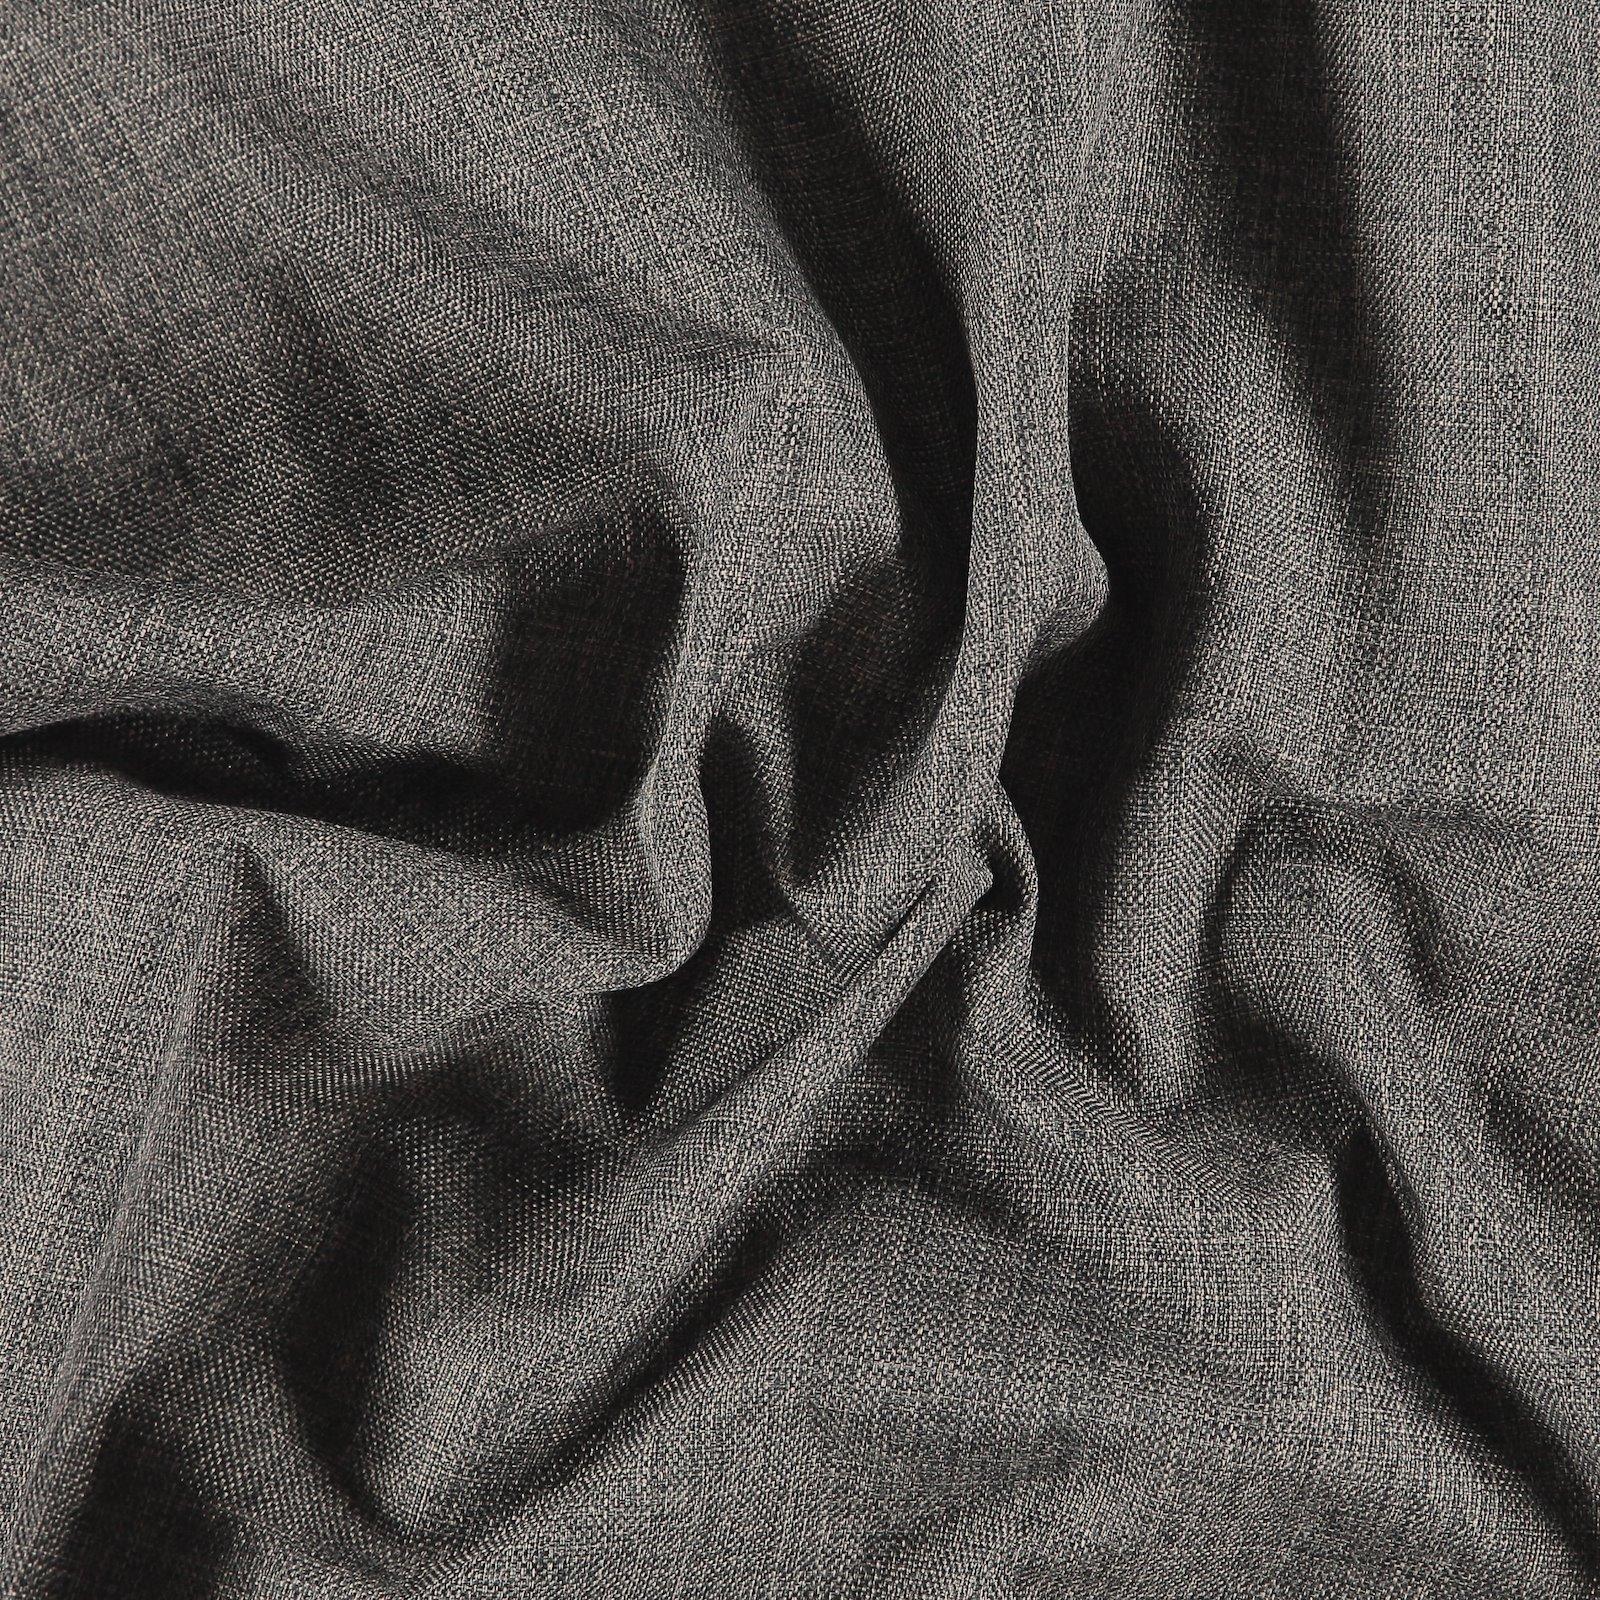 Blackout dk grey w white backing 880013_pack